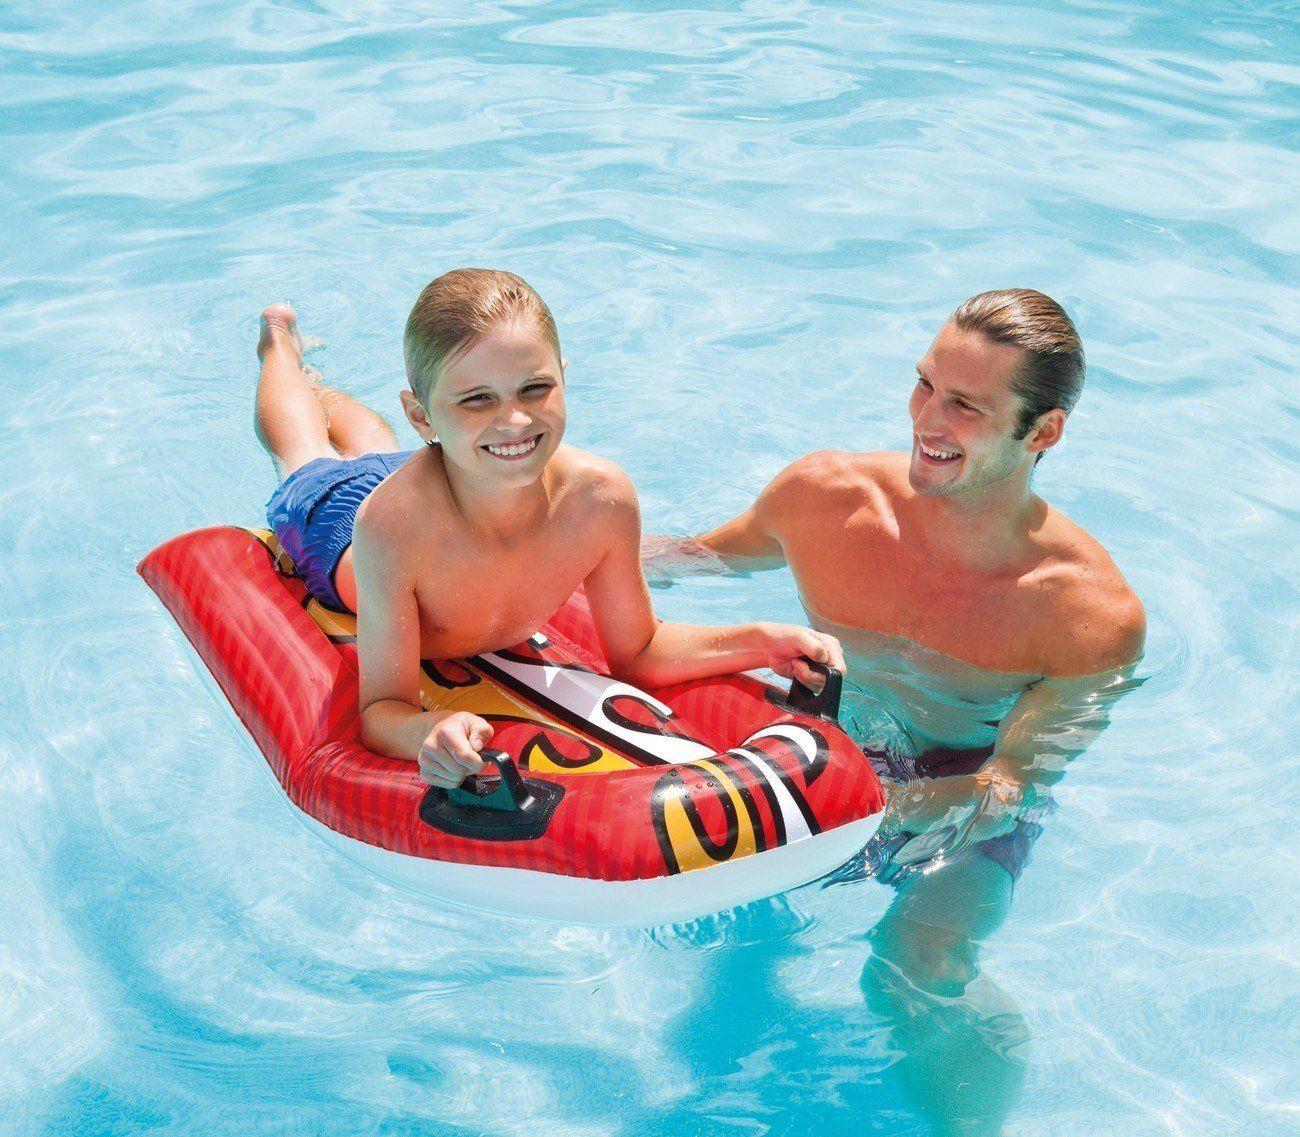 Intex Joy Rider Pool Float (Colors May Vary) Pool floats